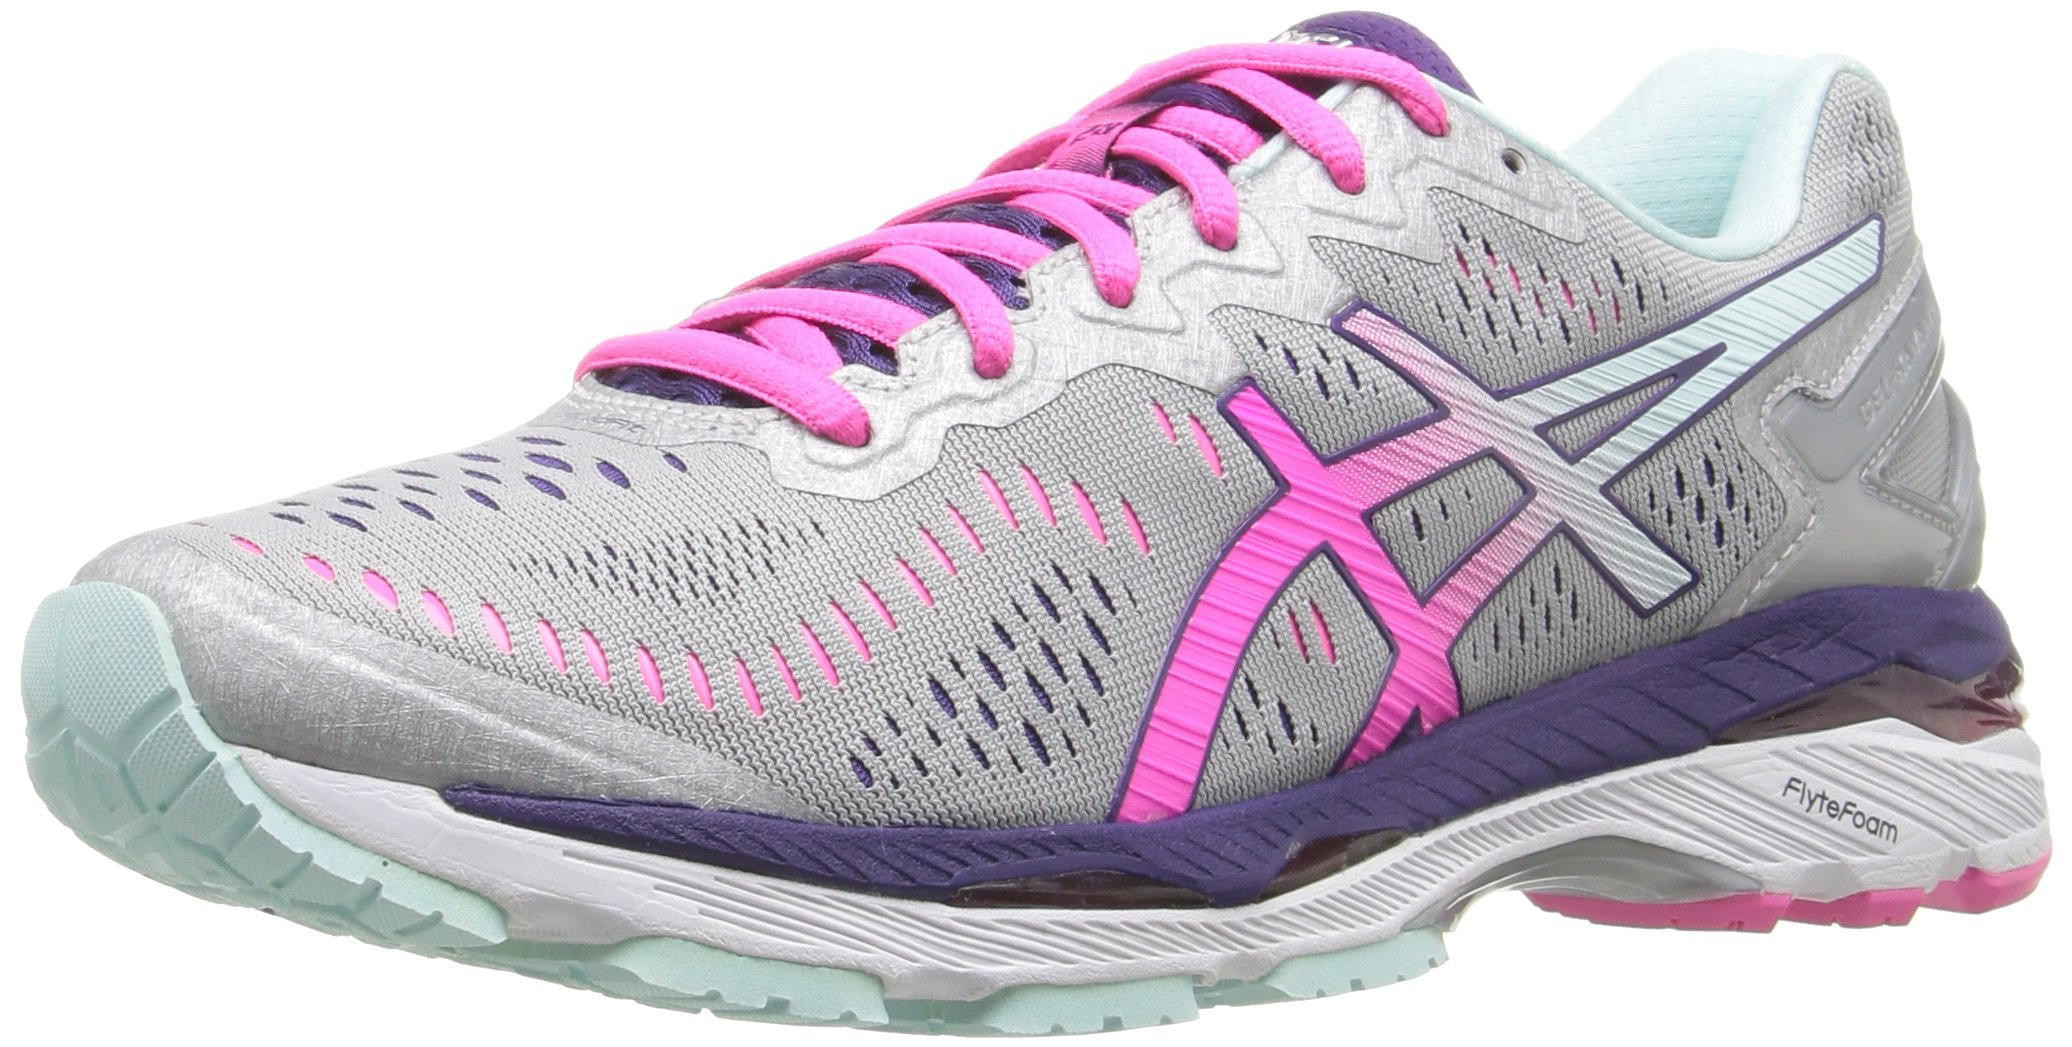 81D5fefswAL - ASICS Women's Gel-Kayano 23 Running Shoe, Silver/Pink Glow/Parachute Purple, 5.5 UK